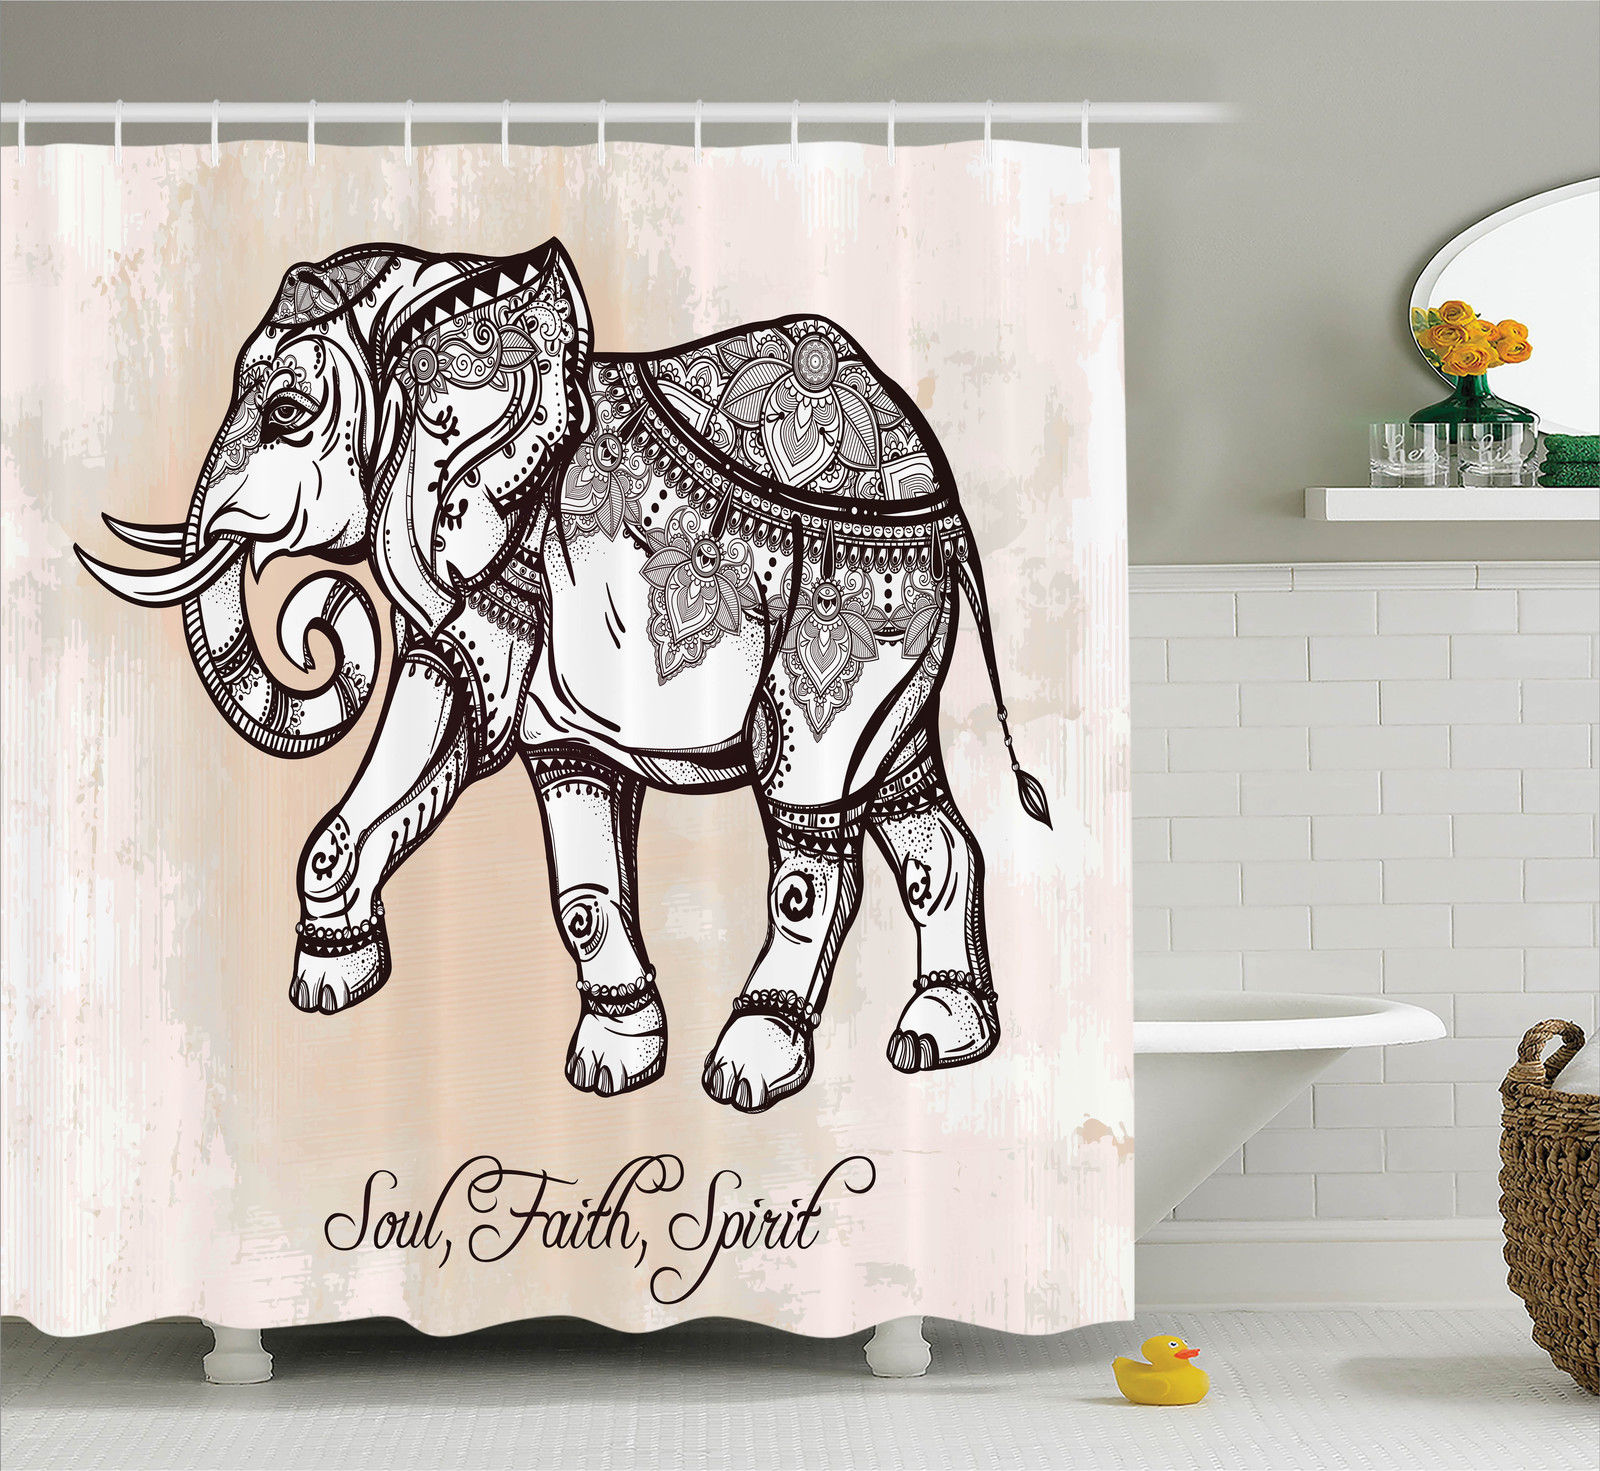 Elephants Decor Shower Curtain Set, Indian Ethnic Elephant Illustration Oriental Mandala Style Patterns Boho Home Decor, Bathroom Accessories, 69W X 70L Inches, By Ambesonne